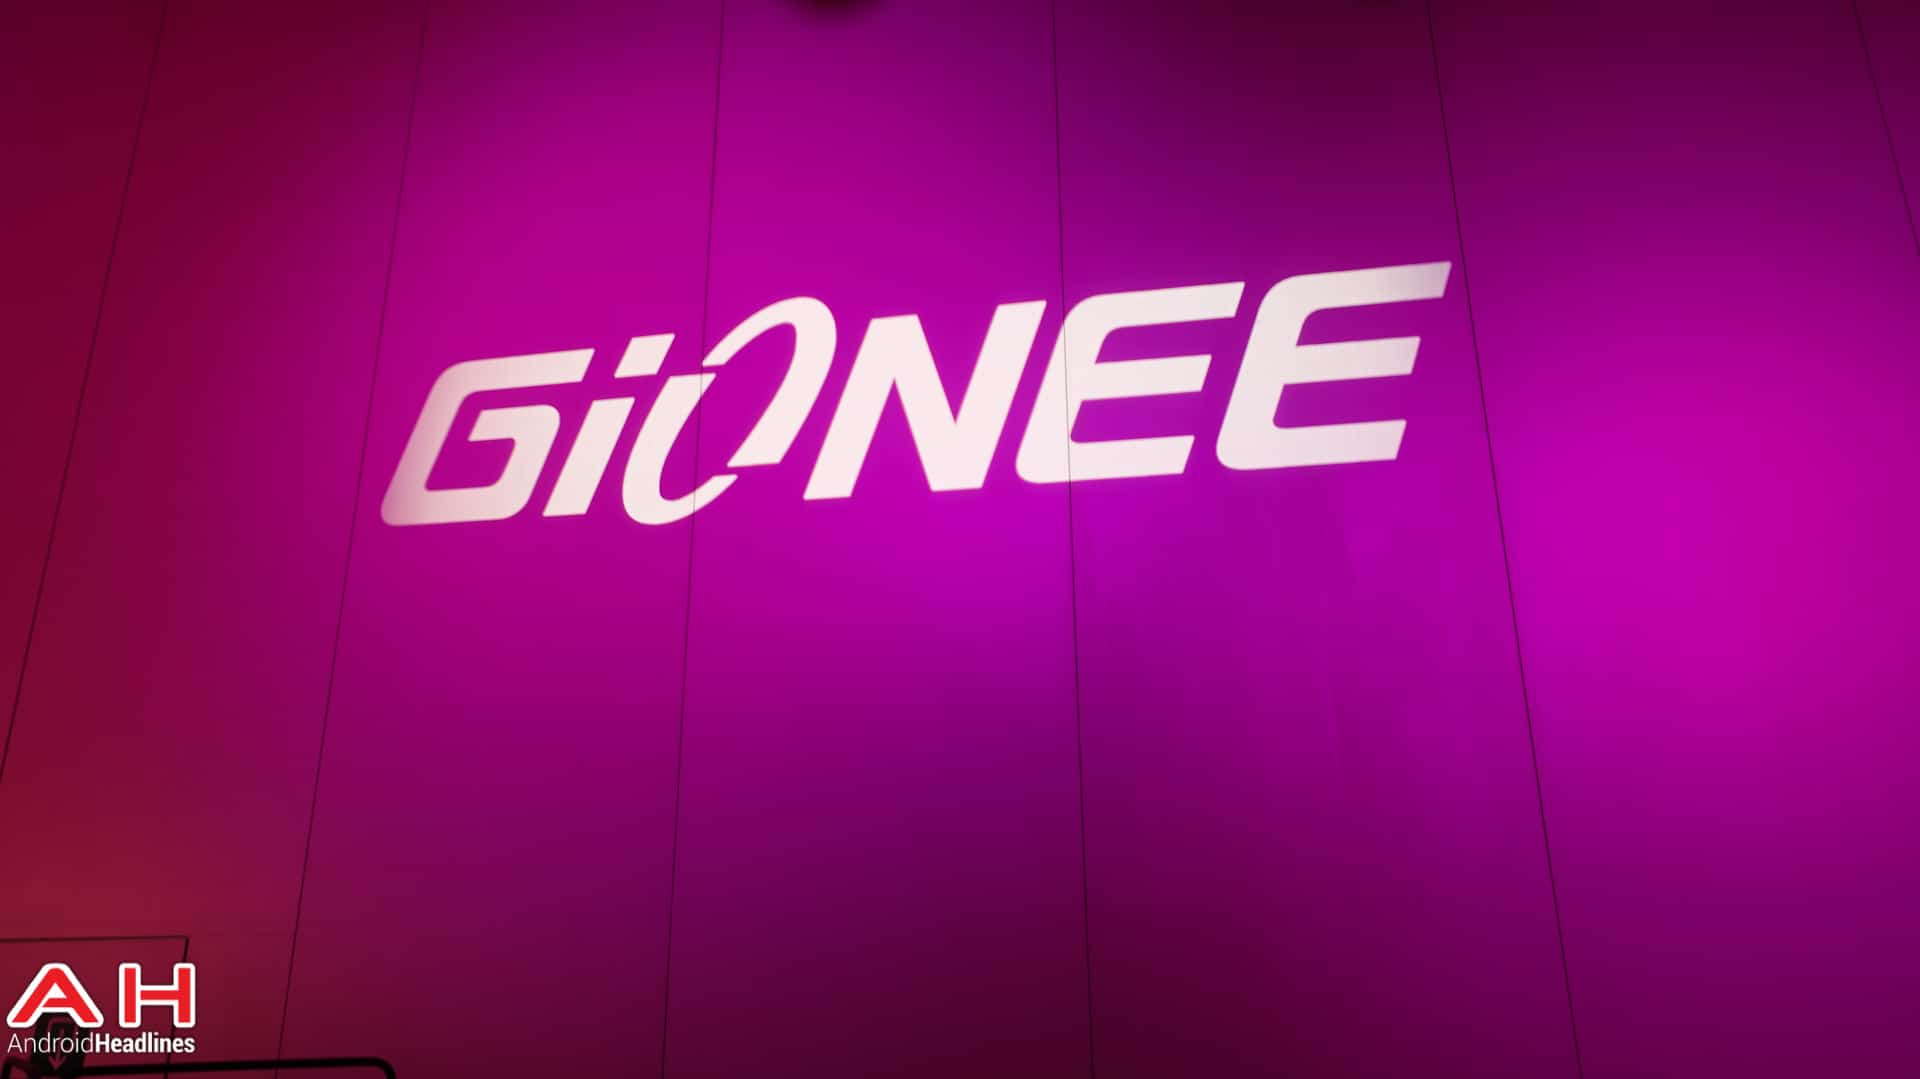 Gionee-Logo-AH1